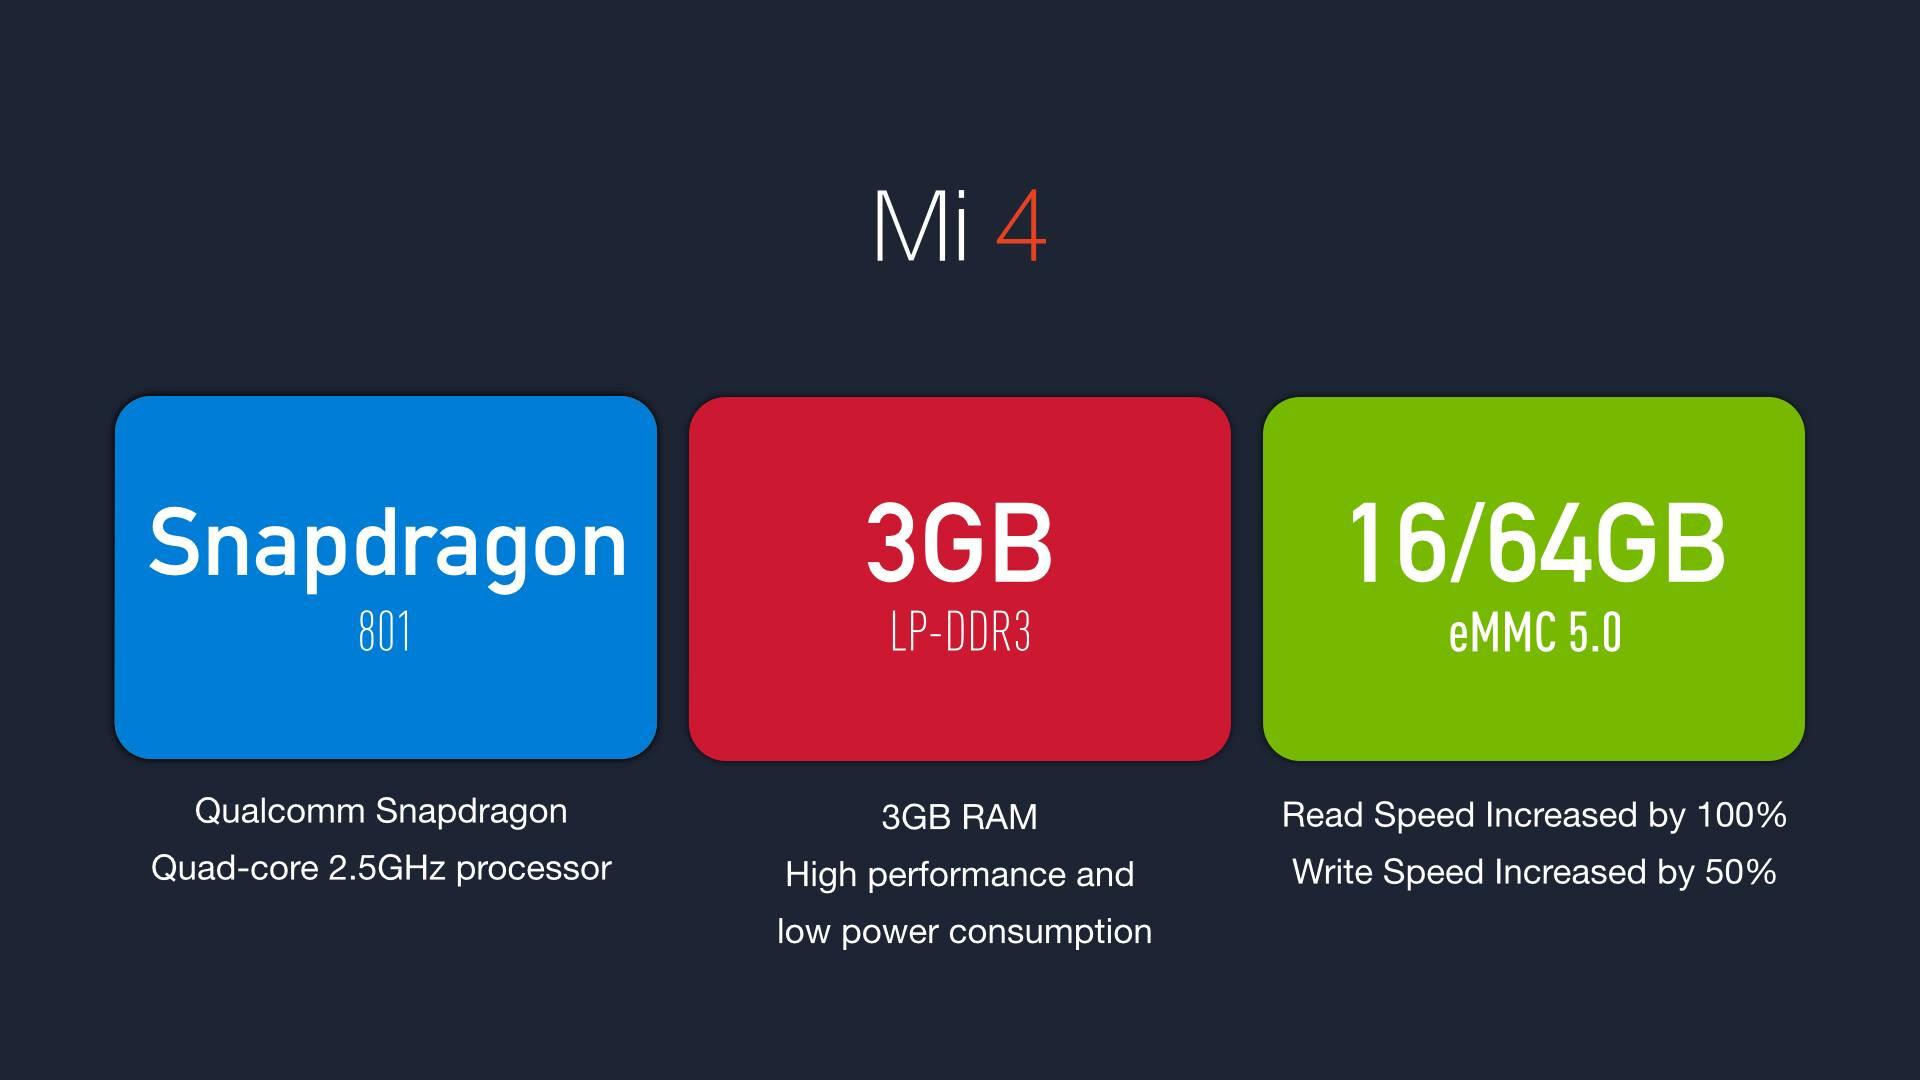 كل ما تريد معرفته عن هاتف Xiaomi Mi4 الجبار 4